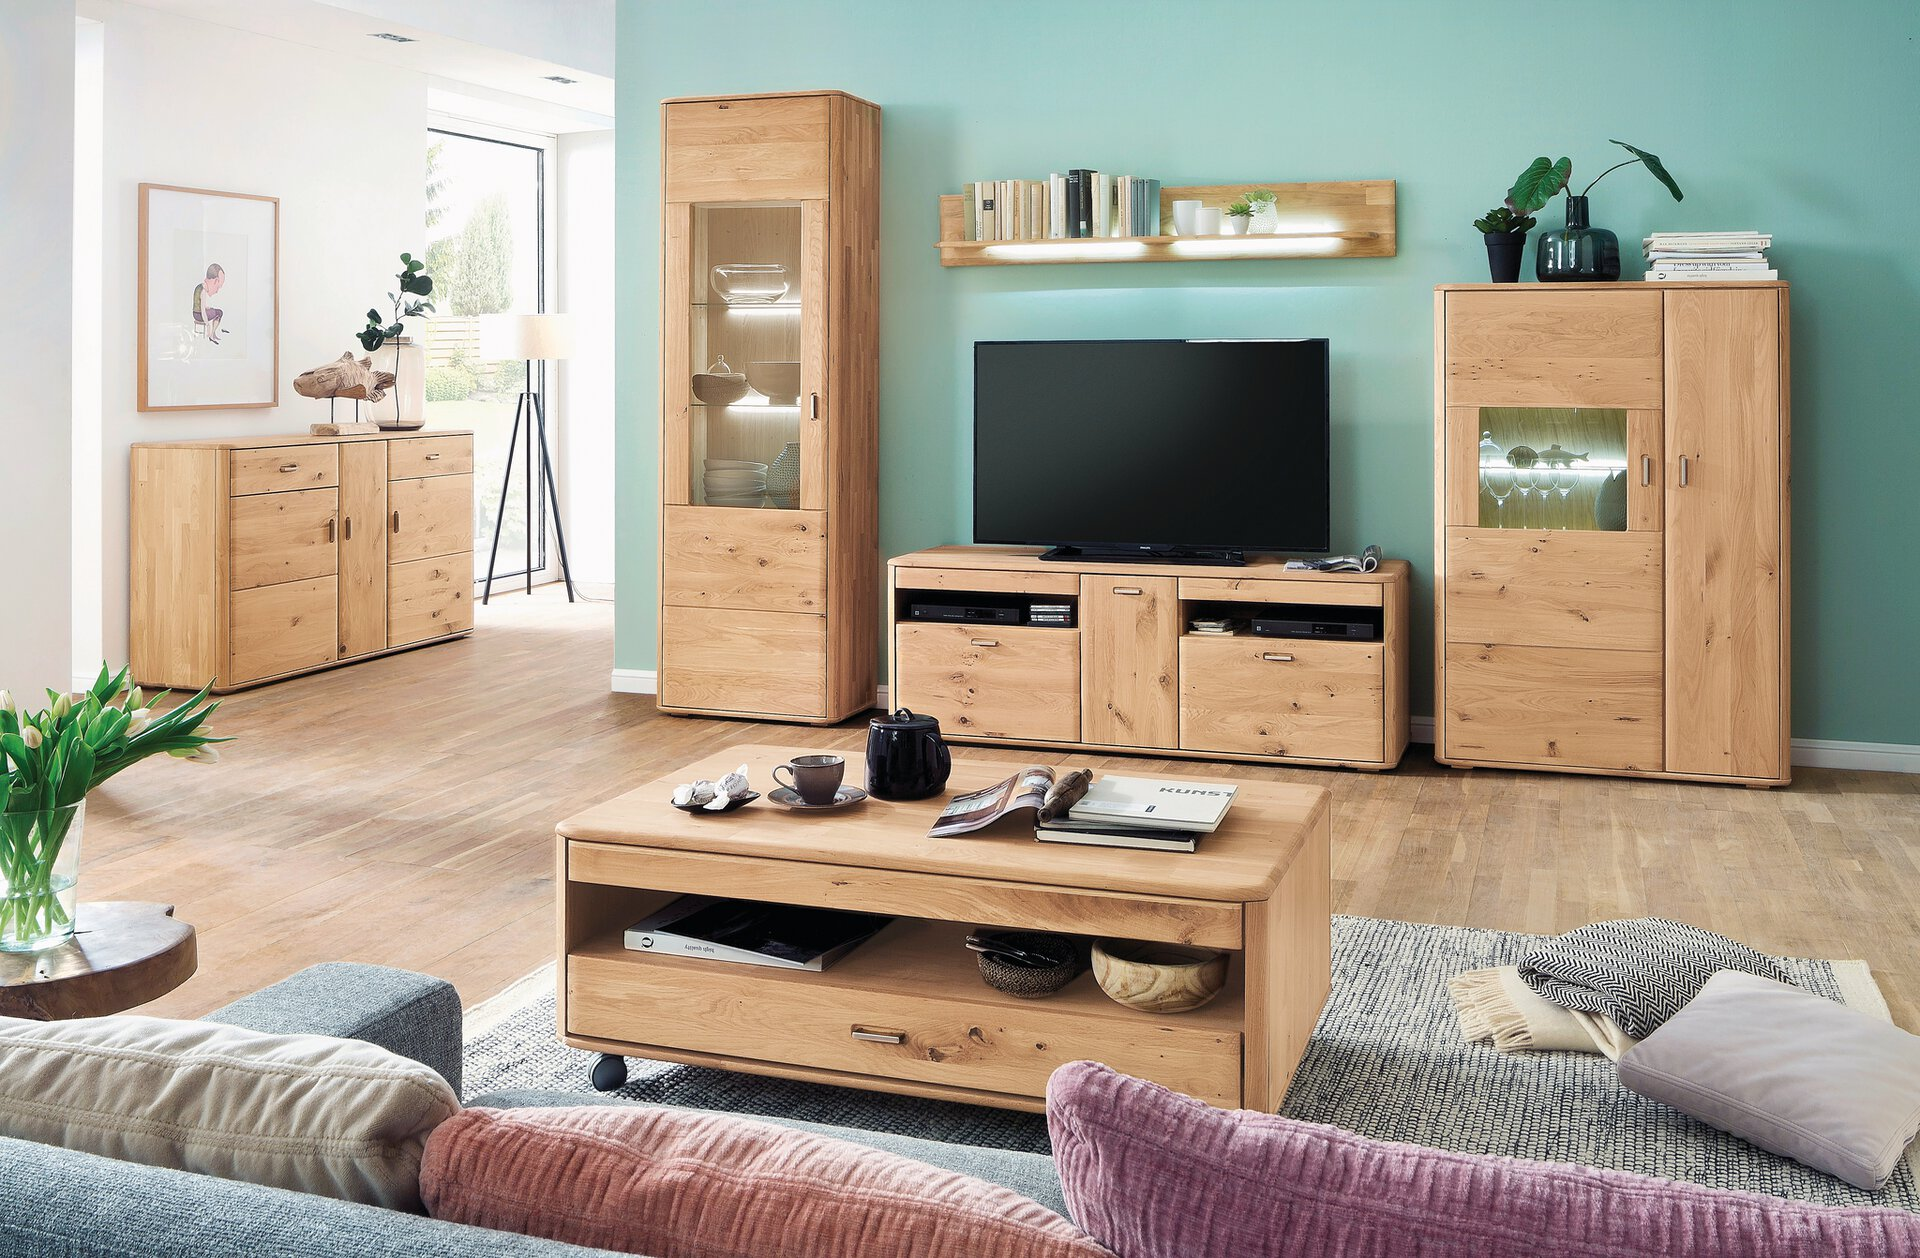 Sideboard TENTRA VALMONDO Holz mehrfarbig 50 x 208 x 323 cm